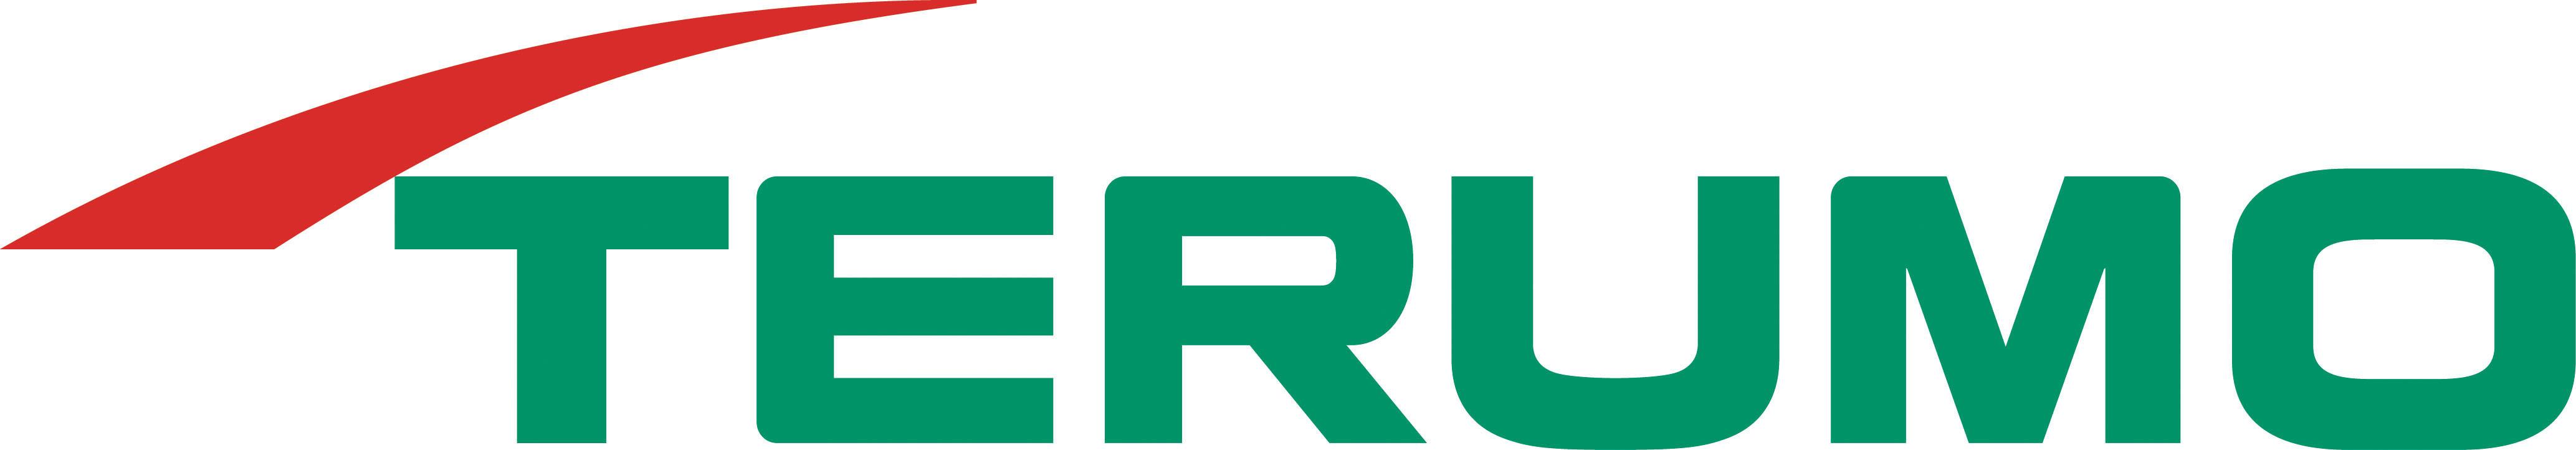 Terumo Cardiovascular Group logo